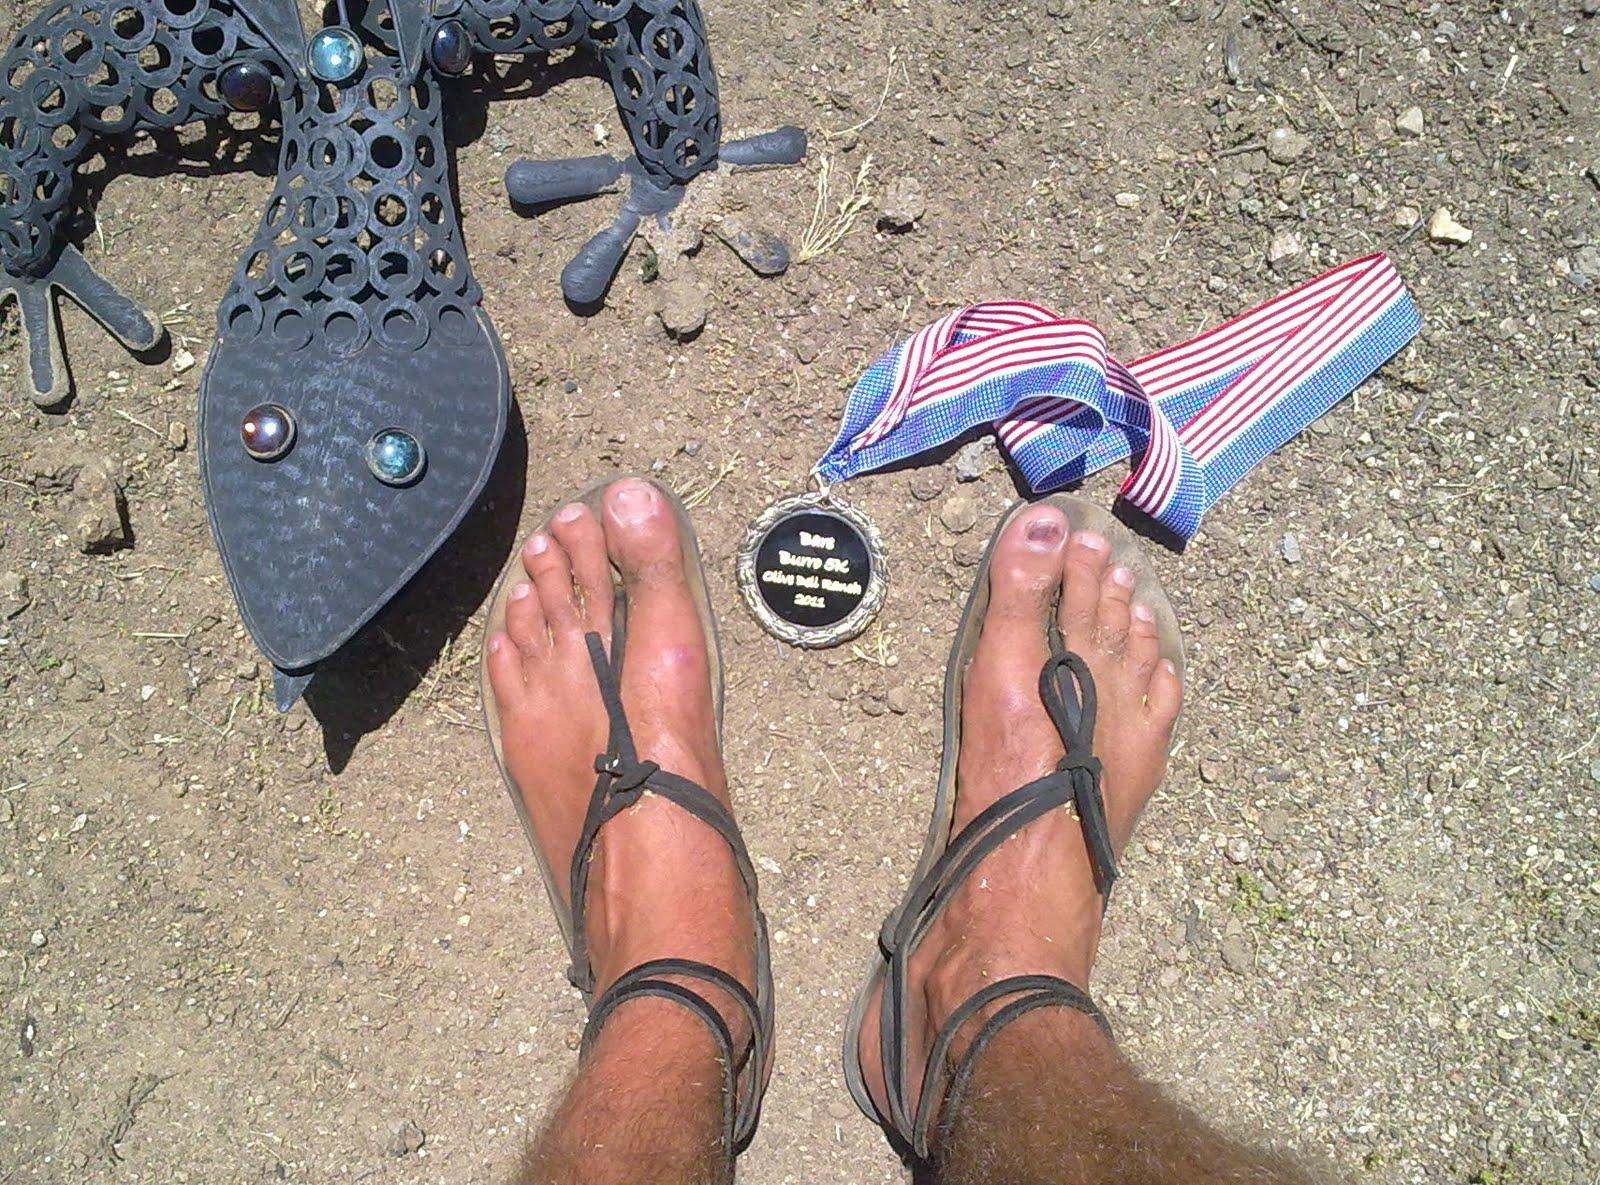 fca559689a1147 Bourbon Feet  Words from a Lunatic  A comprehensive review of Luna Sandals